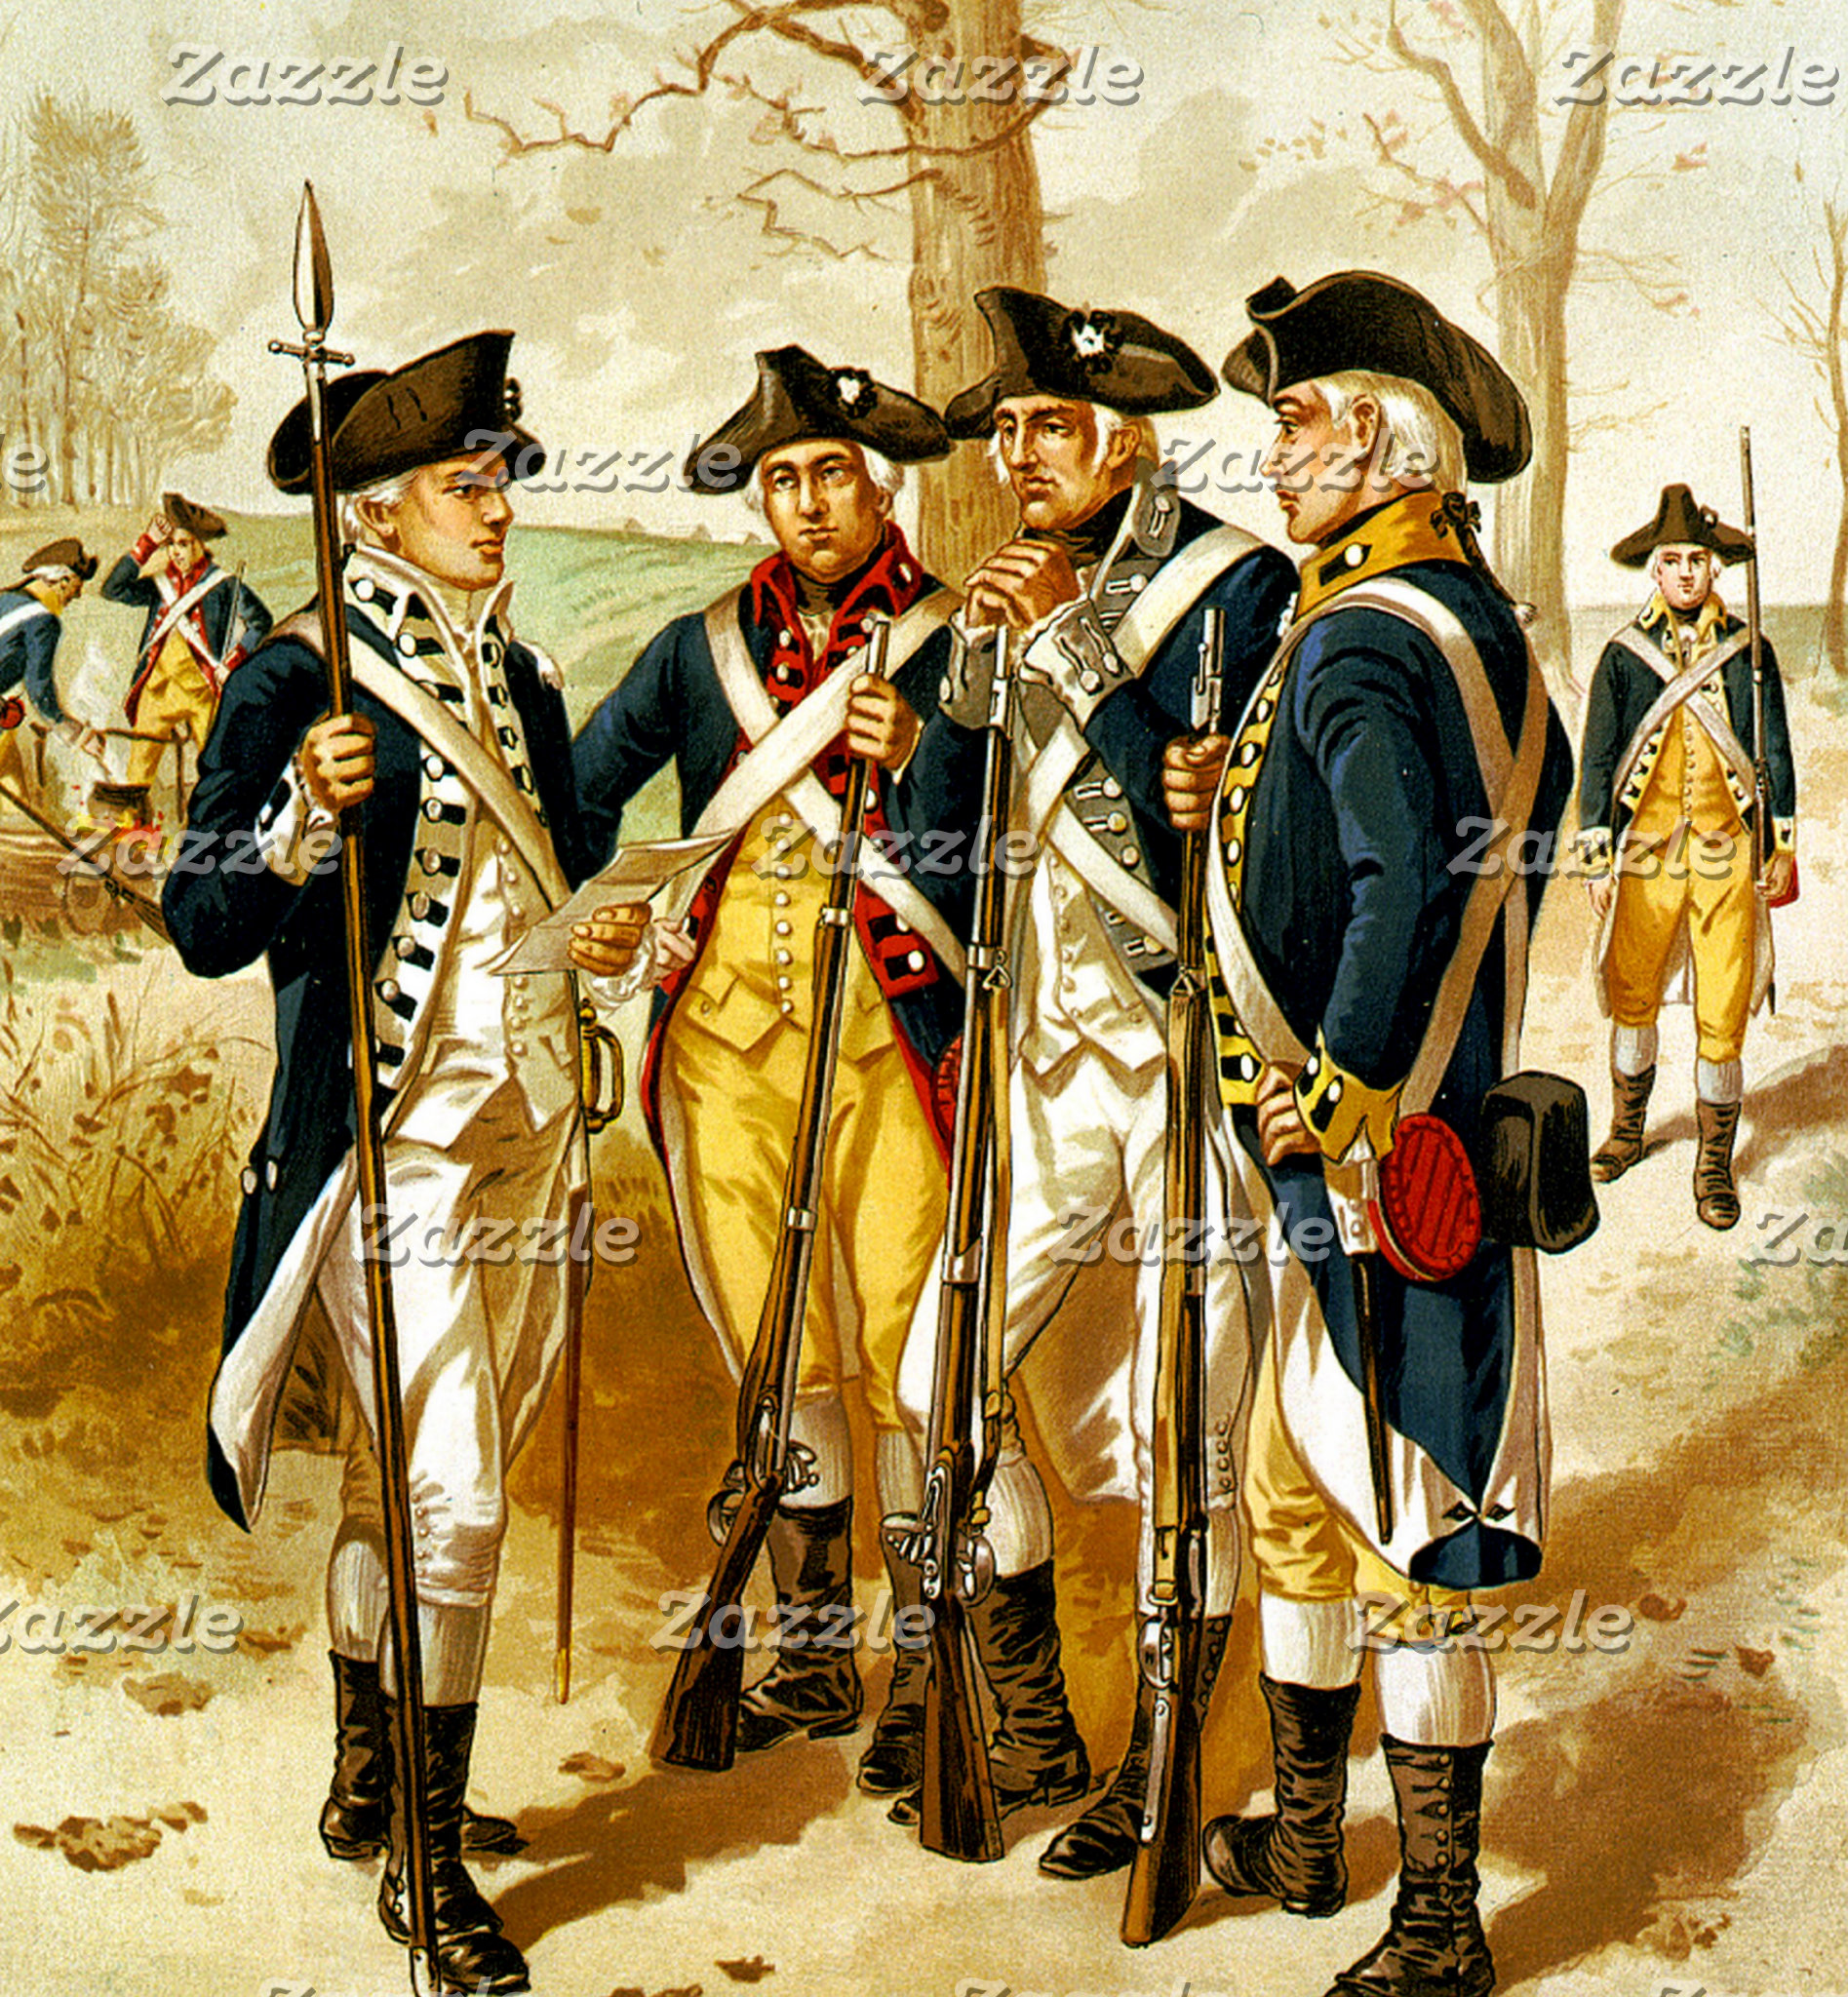 AMERICAN REVOLUTION AND CIVIL WAR